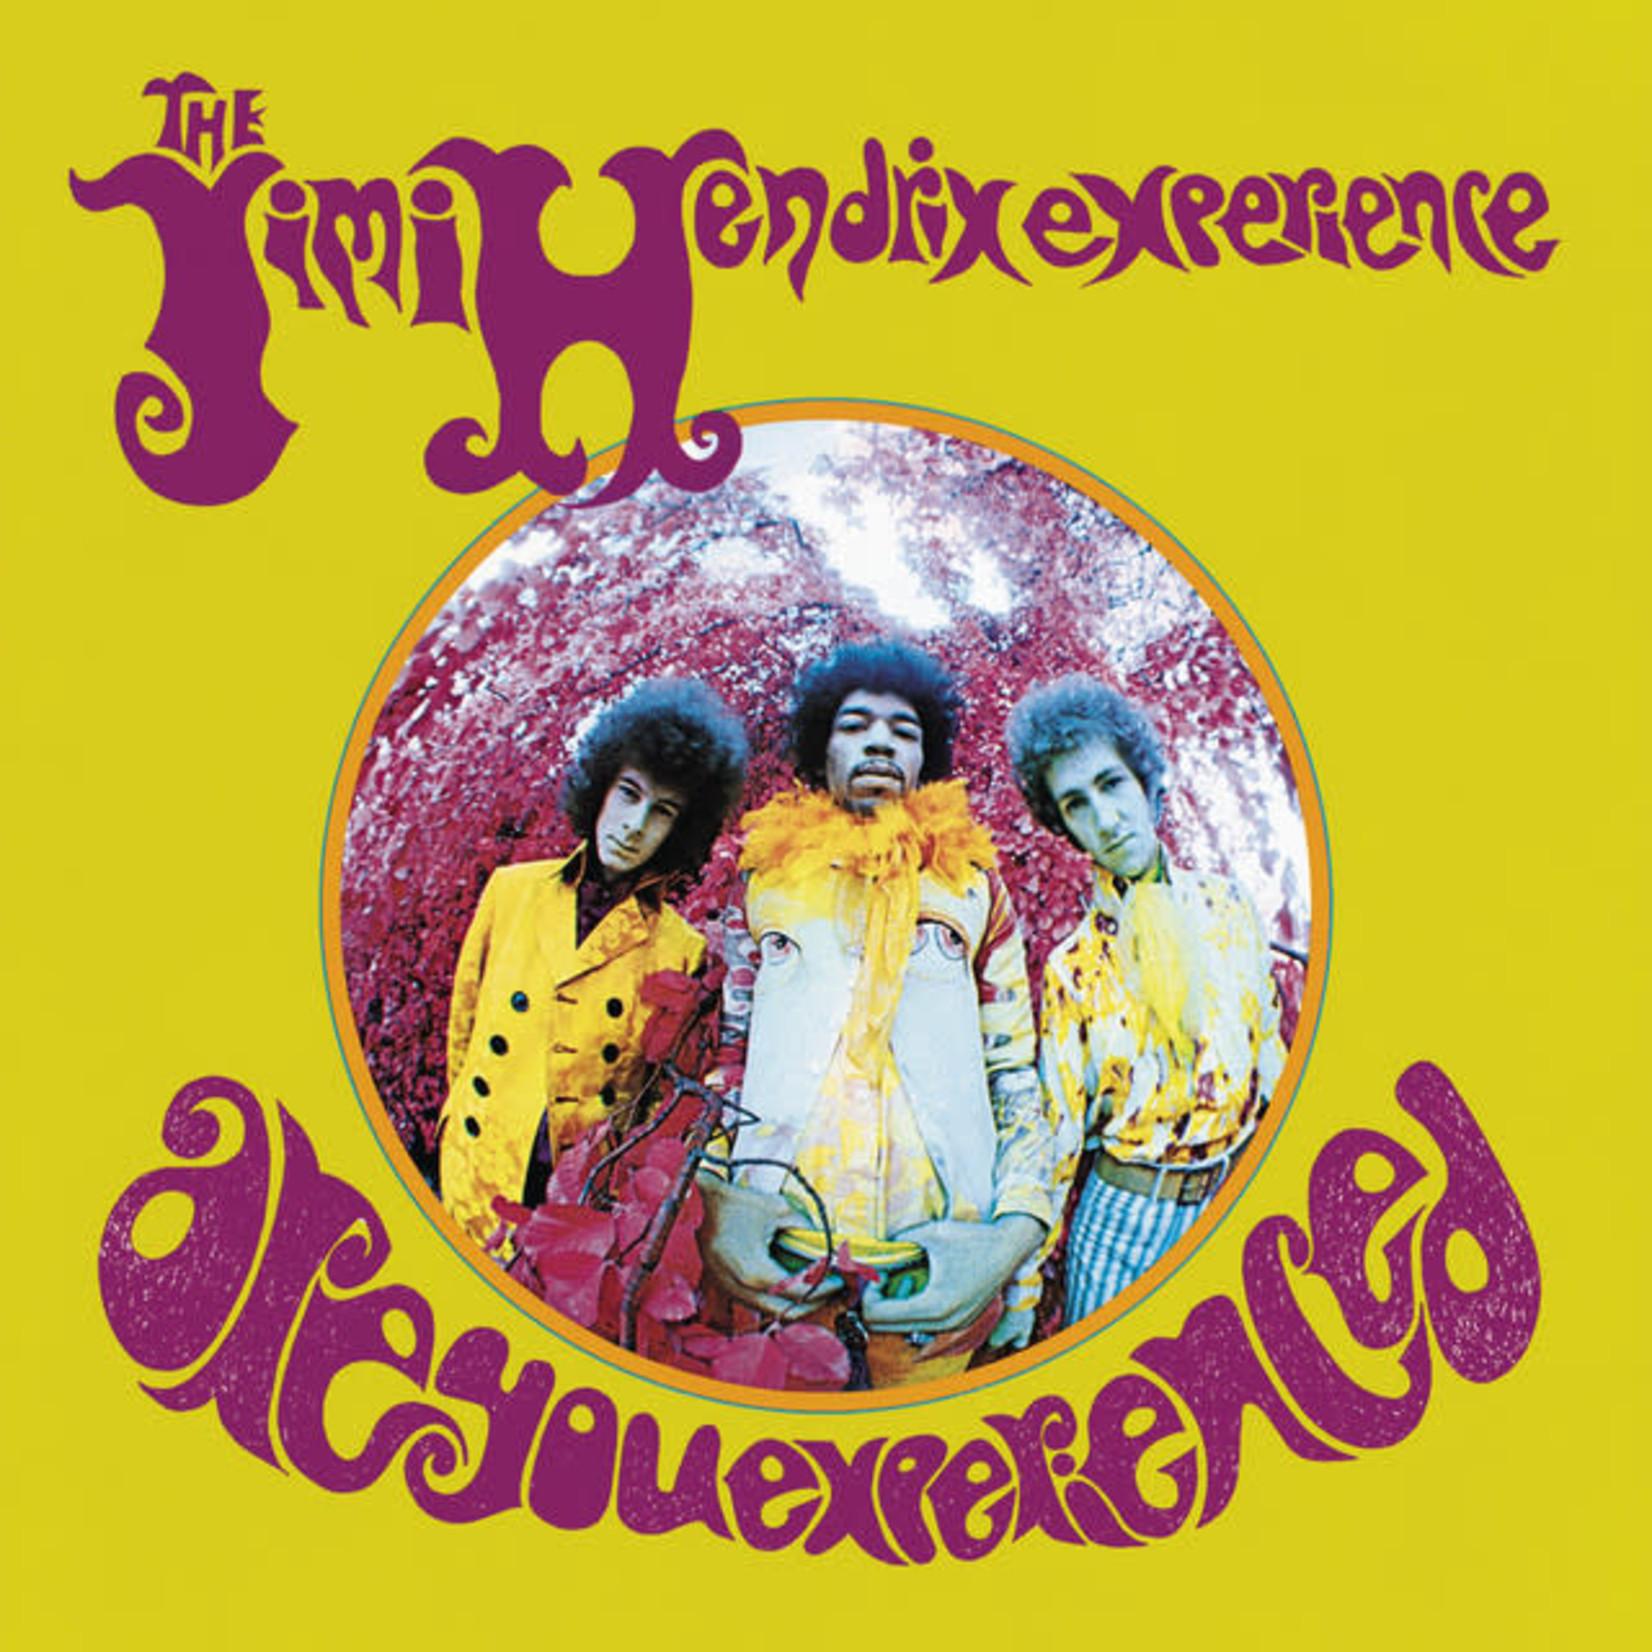 Vinyl Jimi Hendrix Experience - Are You Experienced?